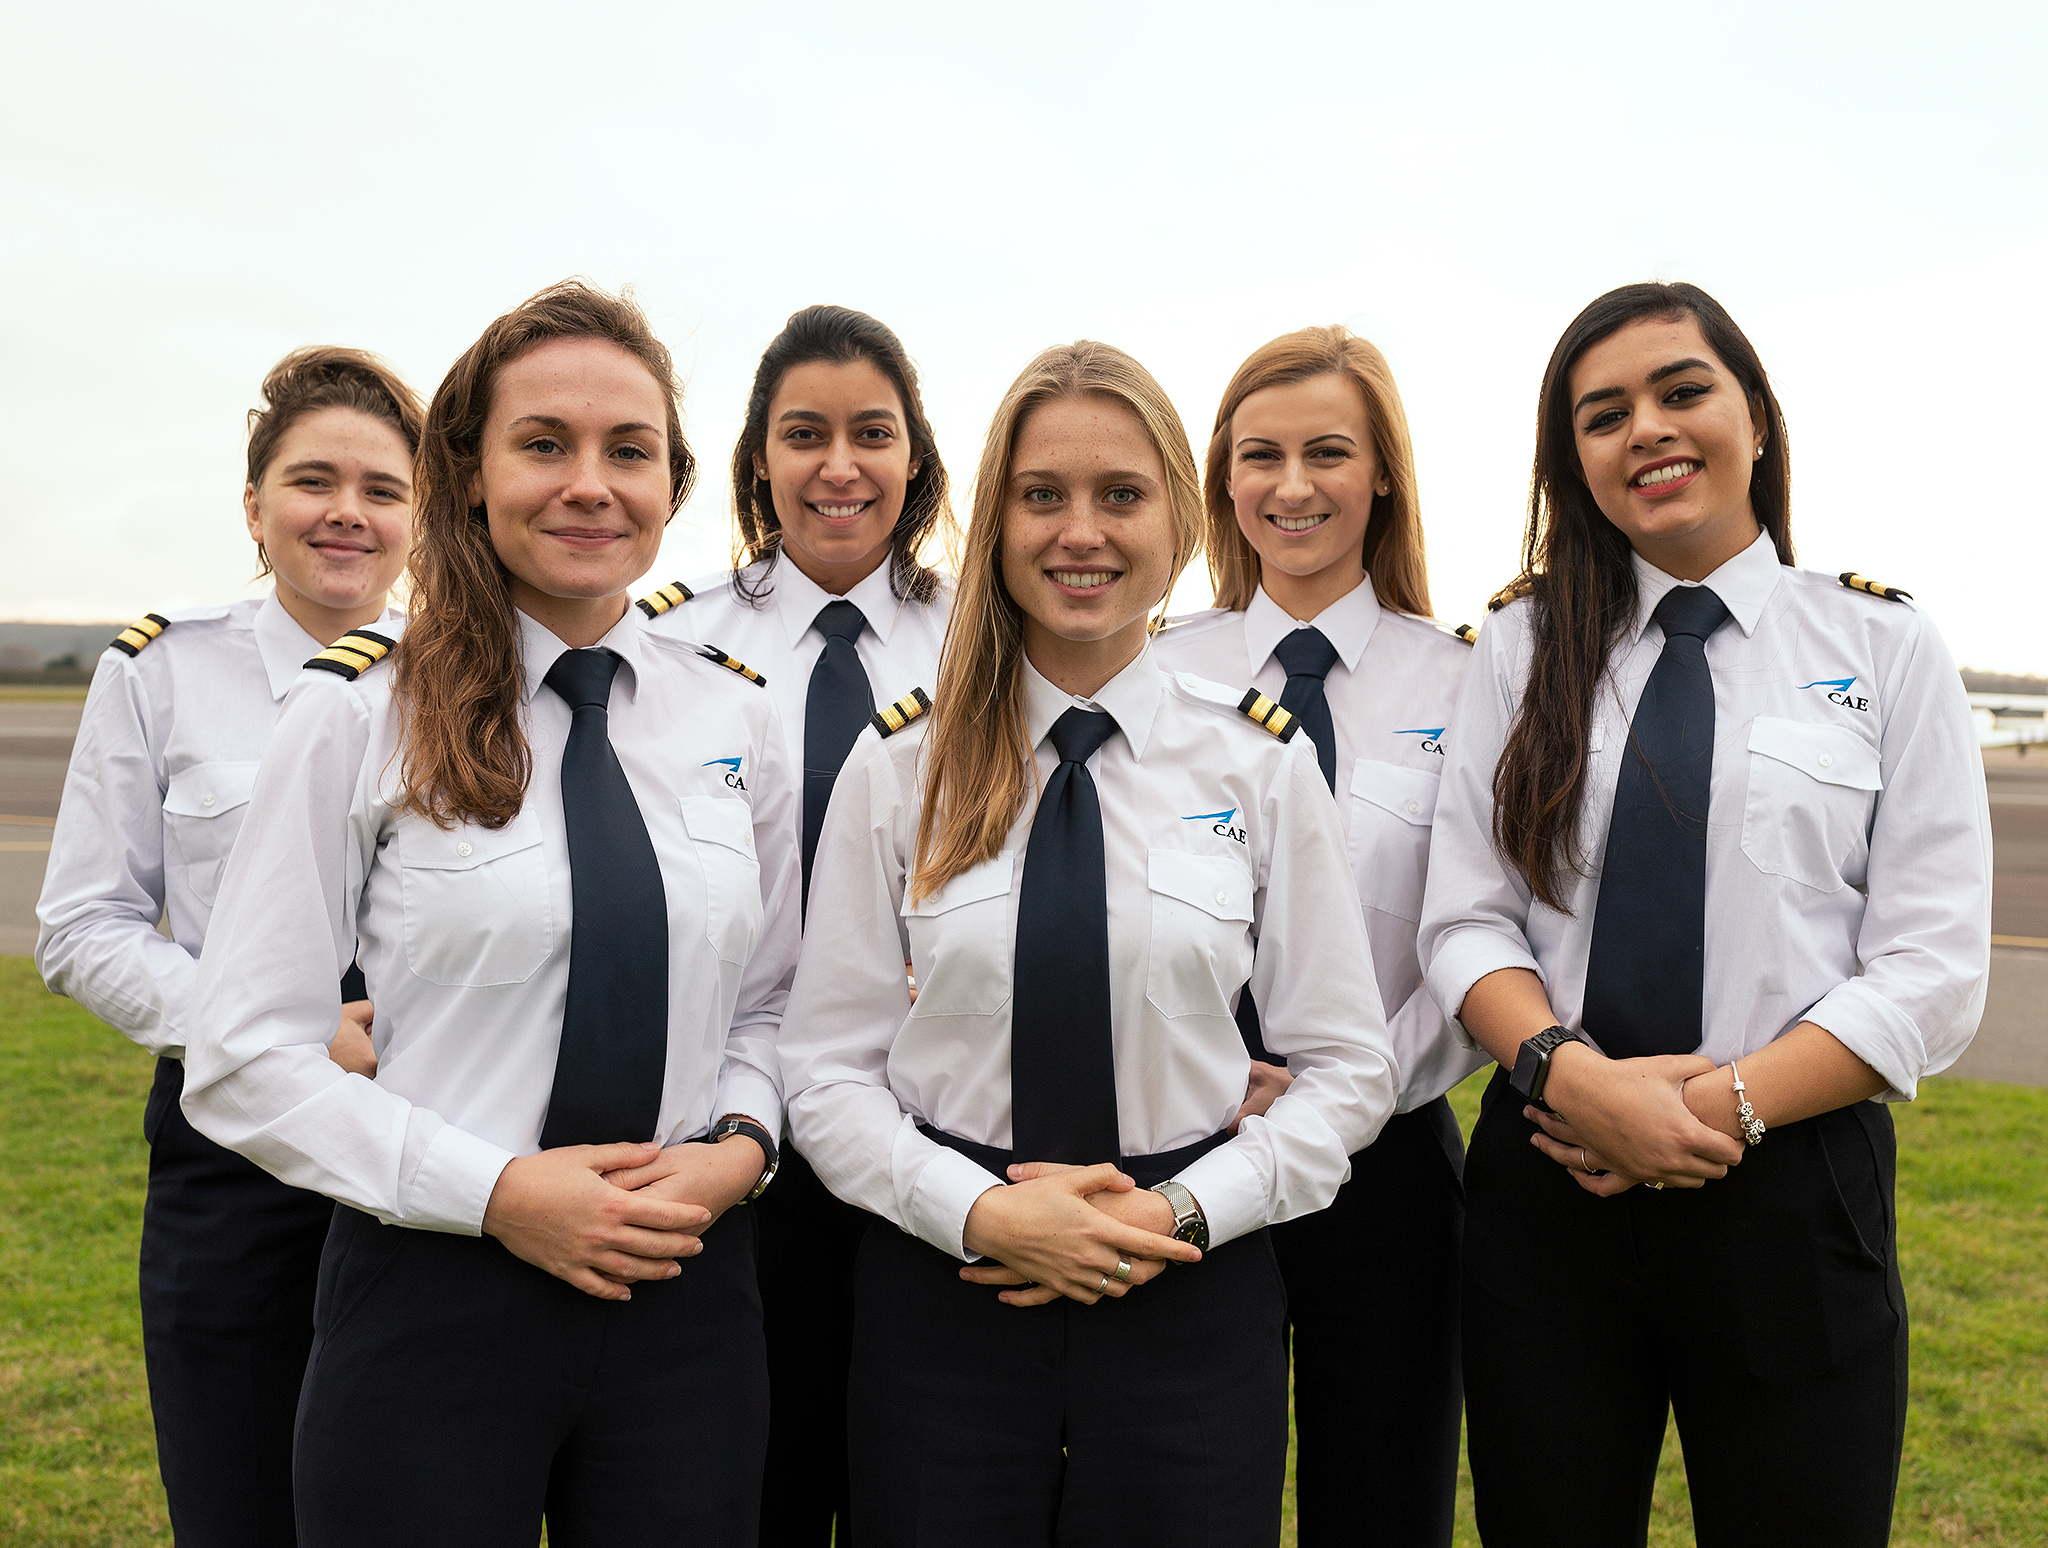 CAE women pilot scholarships